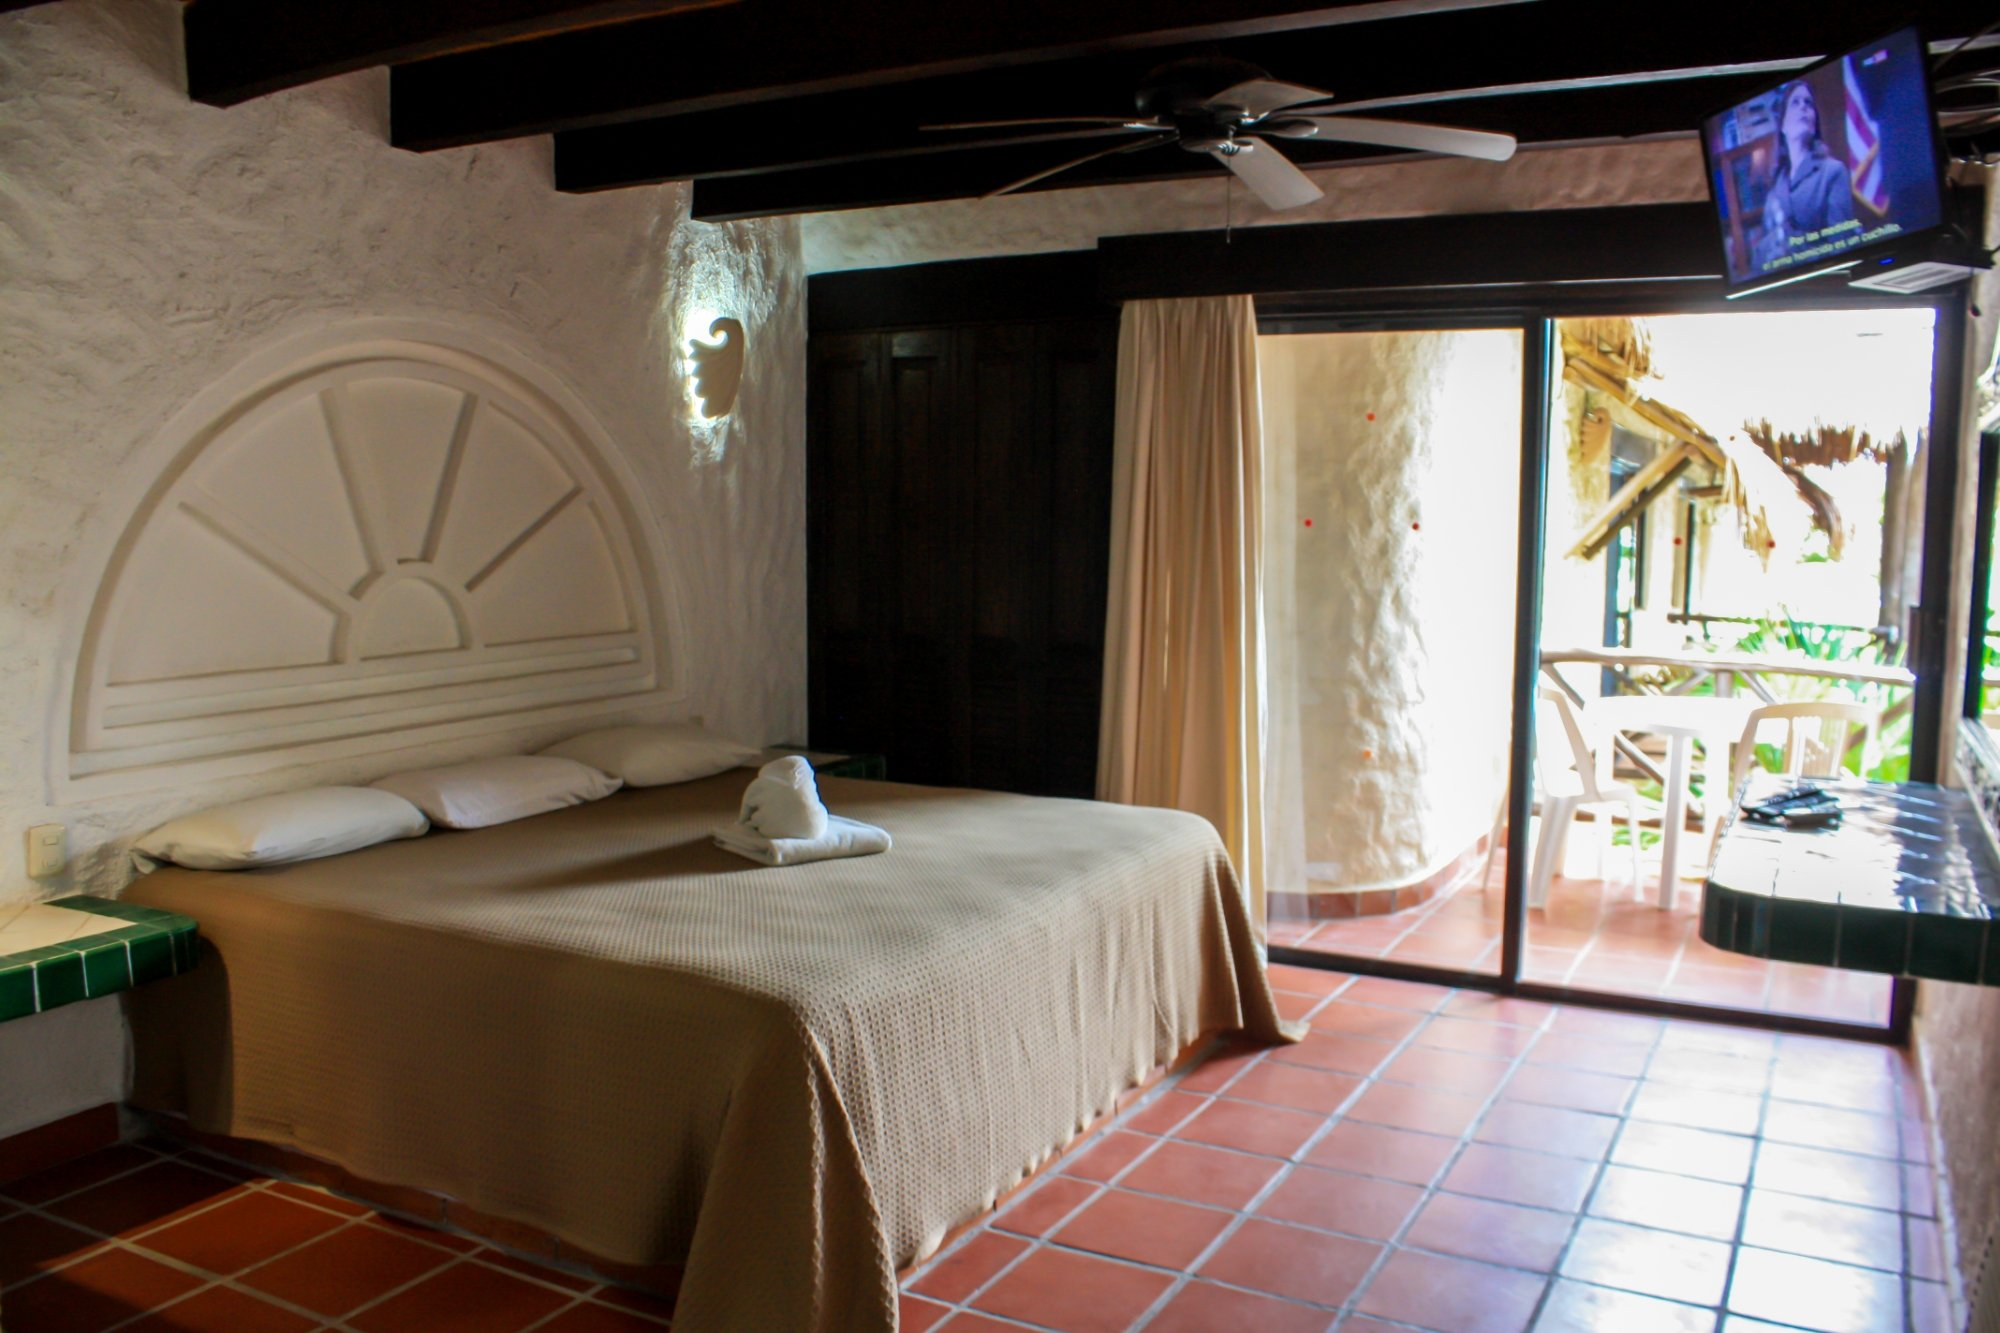 Hotel Mimi del Mar